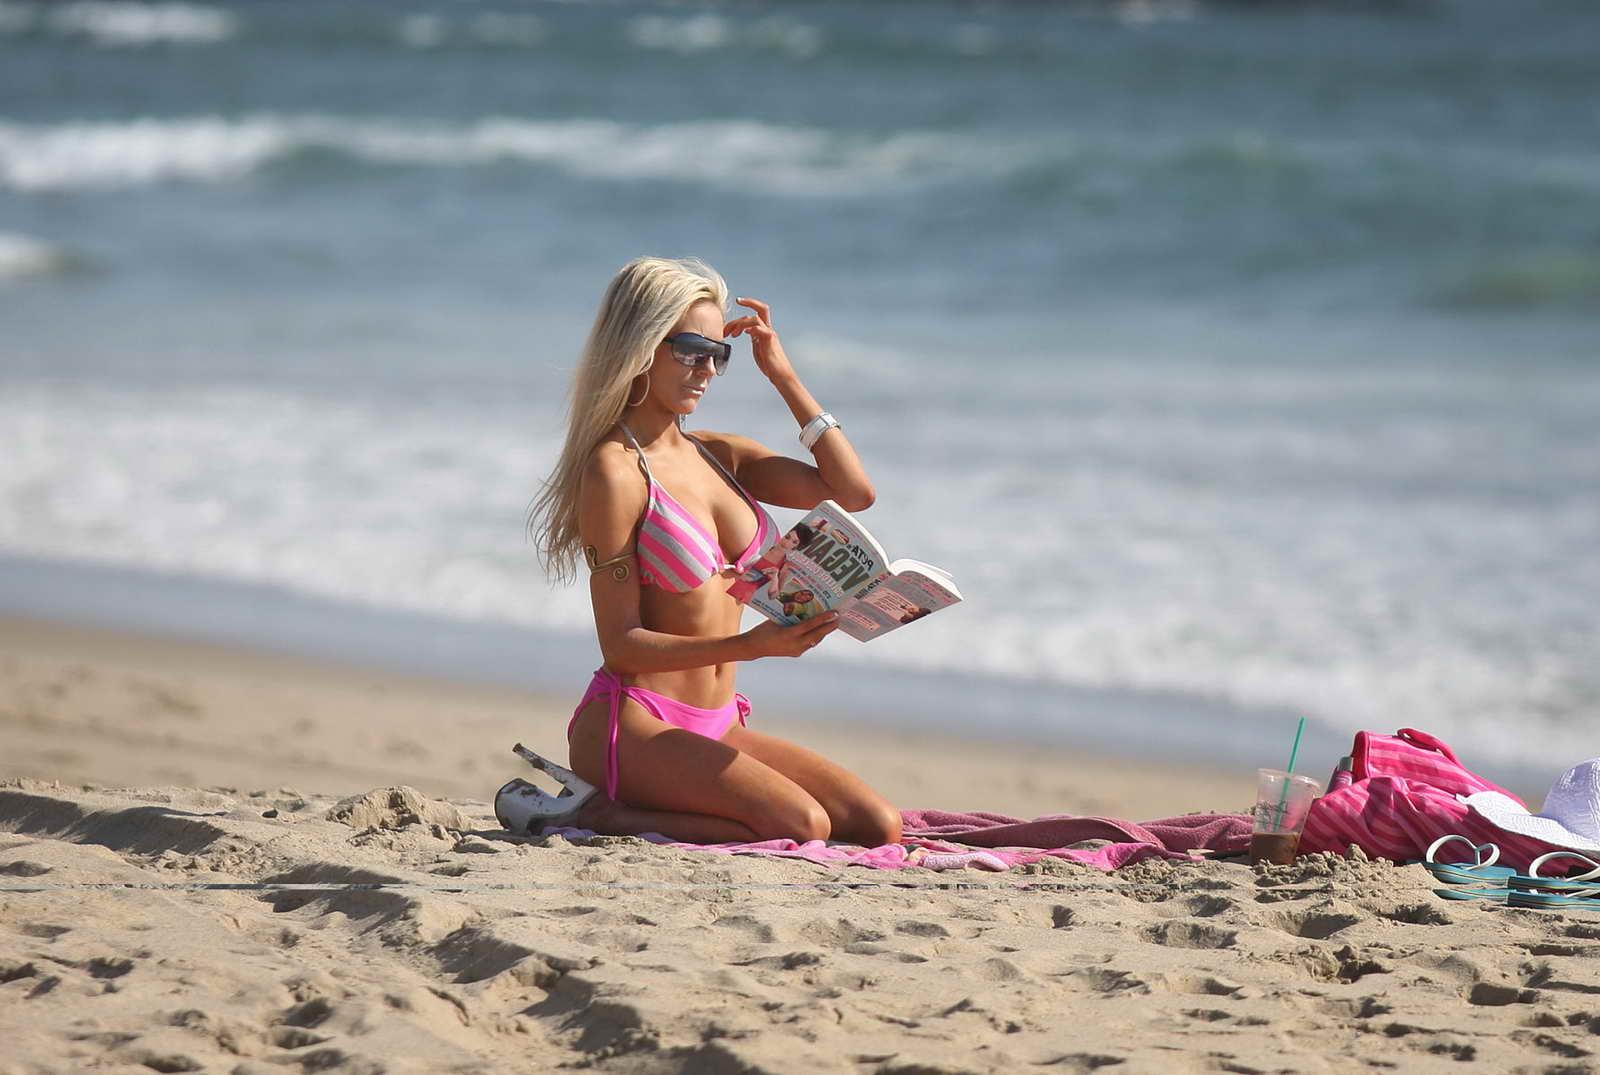 Courtney Stodden in Bikini on the beach in Malibu Pic 28 of 35